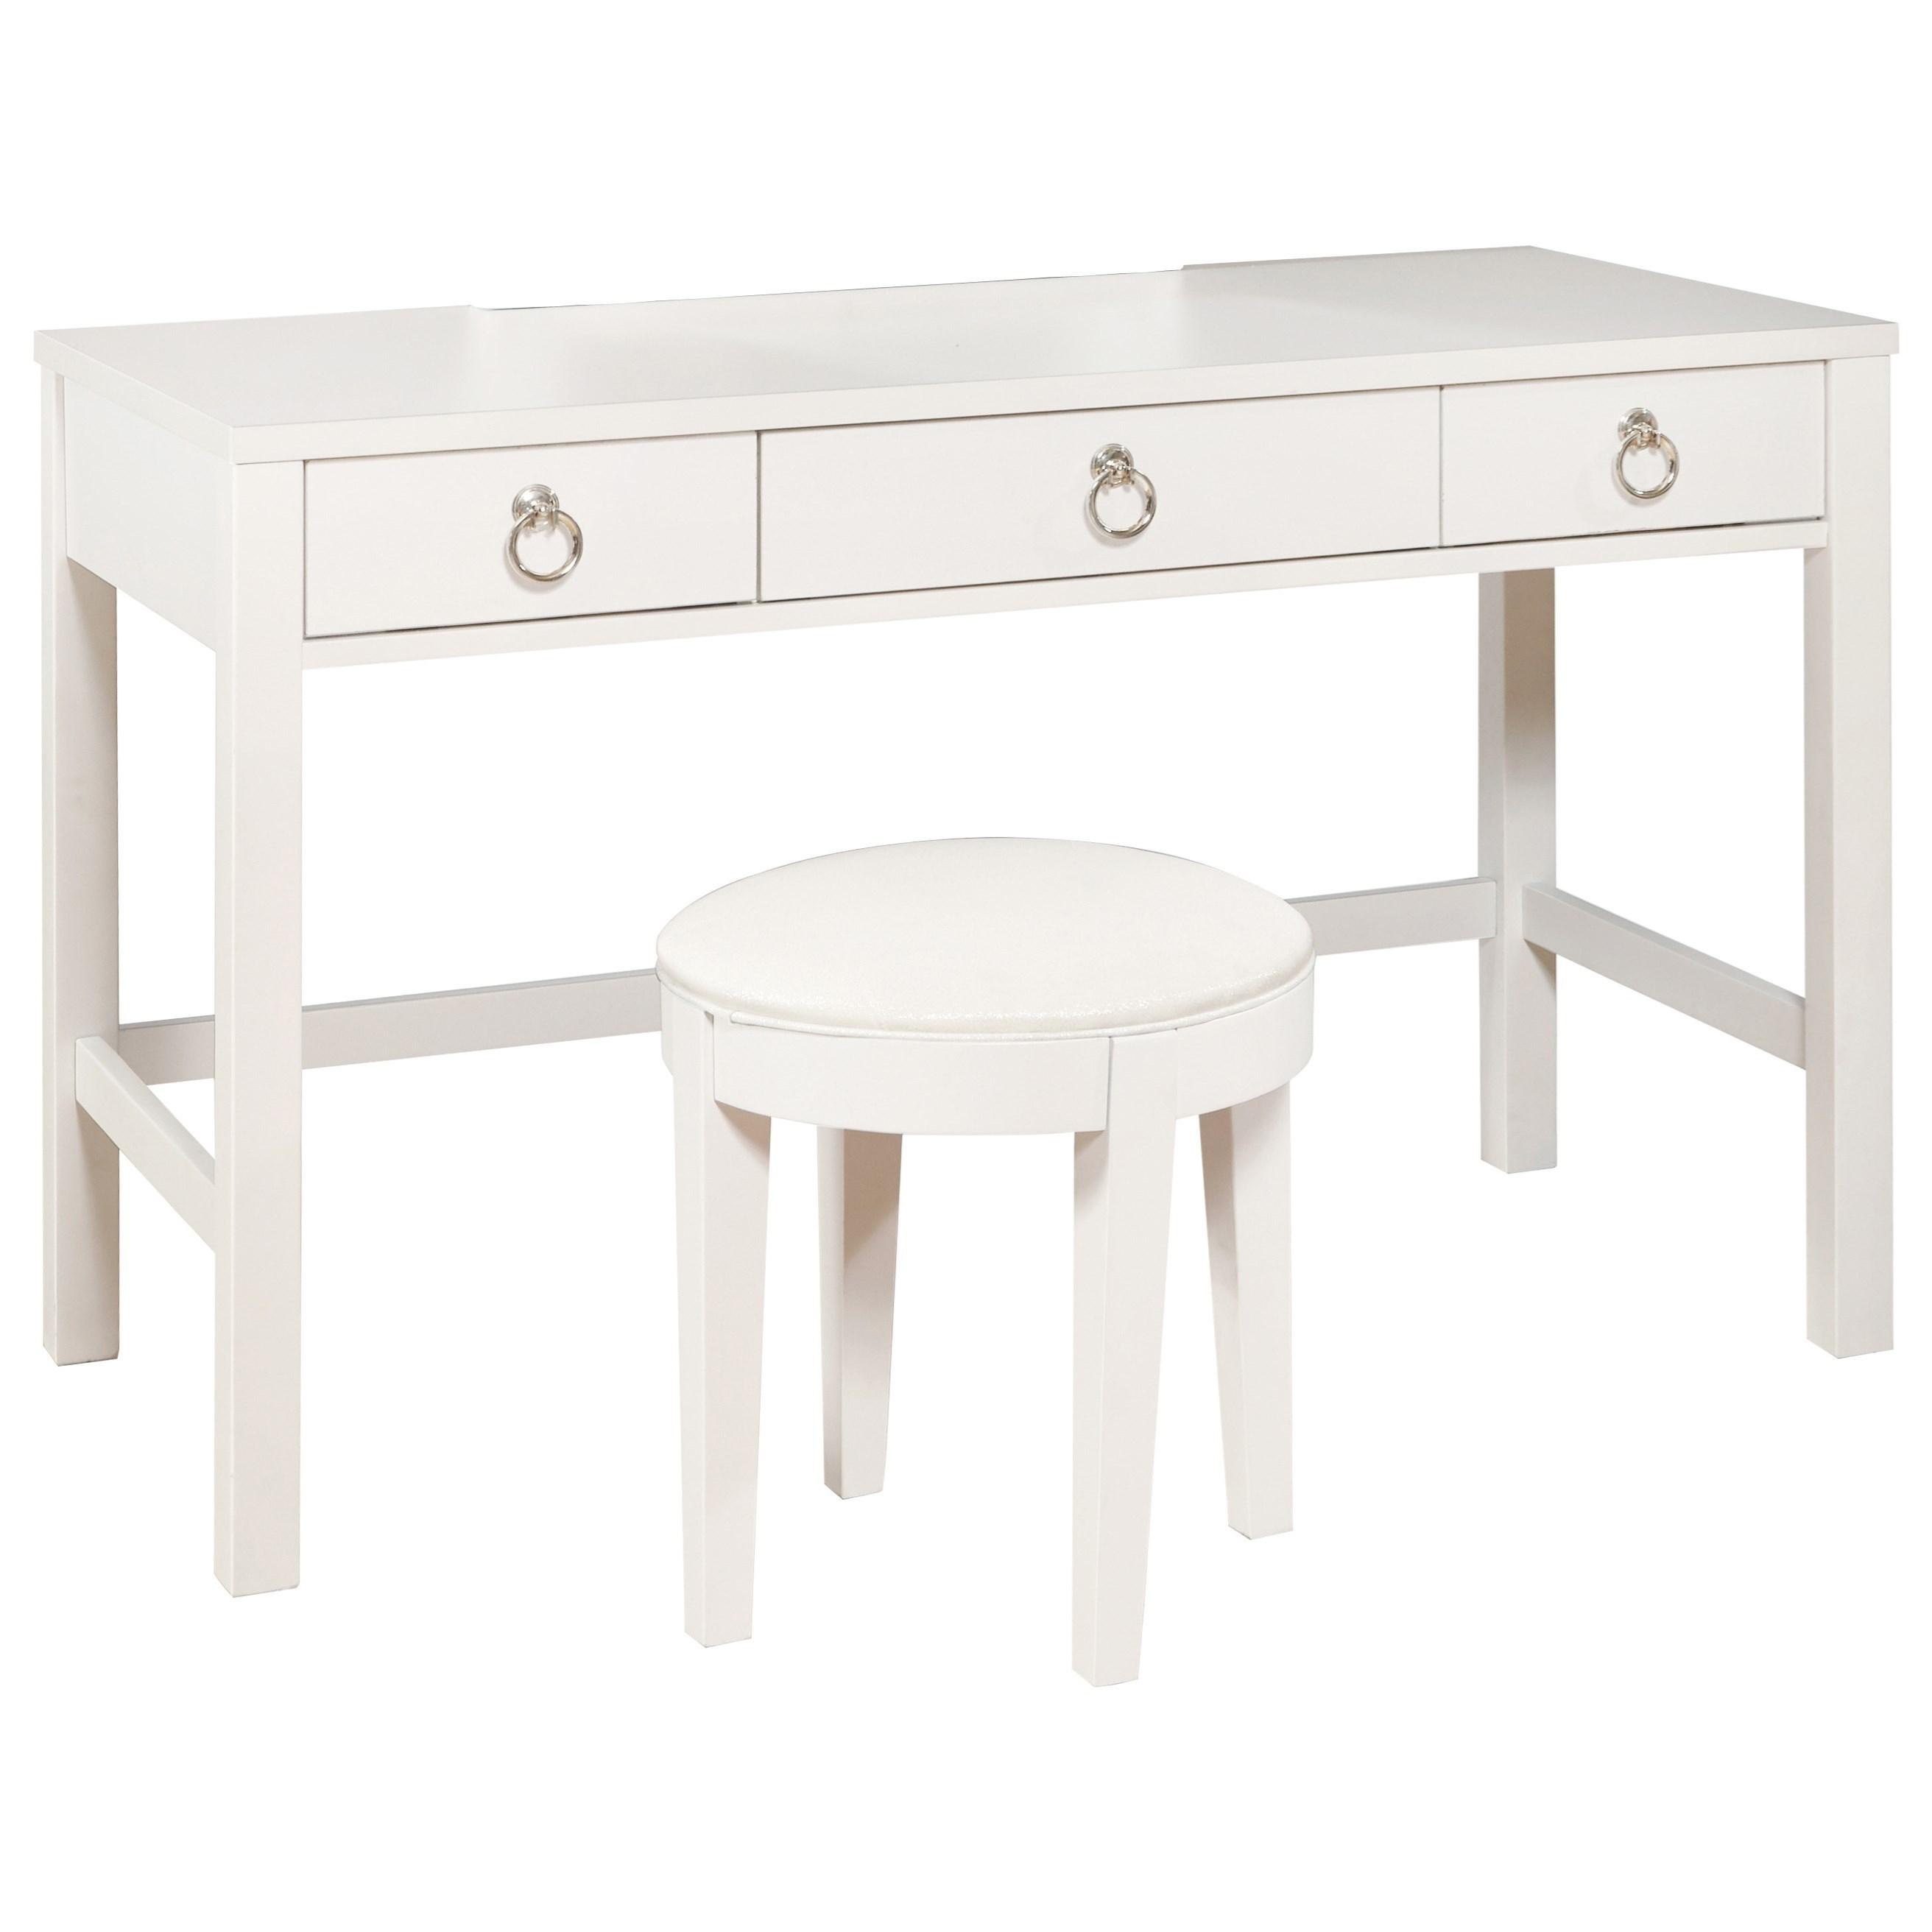 Brit Vanity Desk and Stool Set